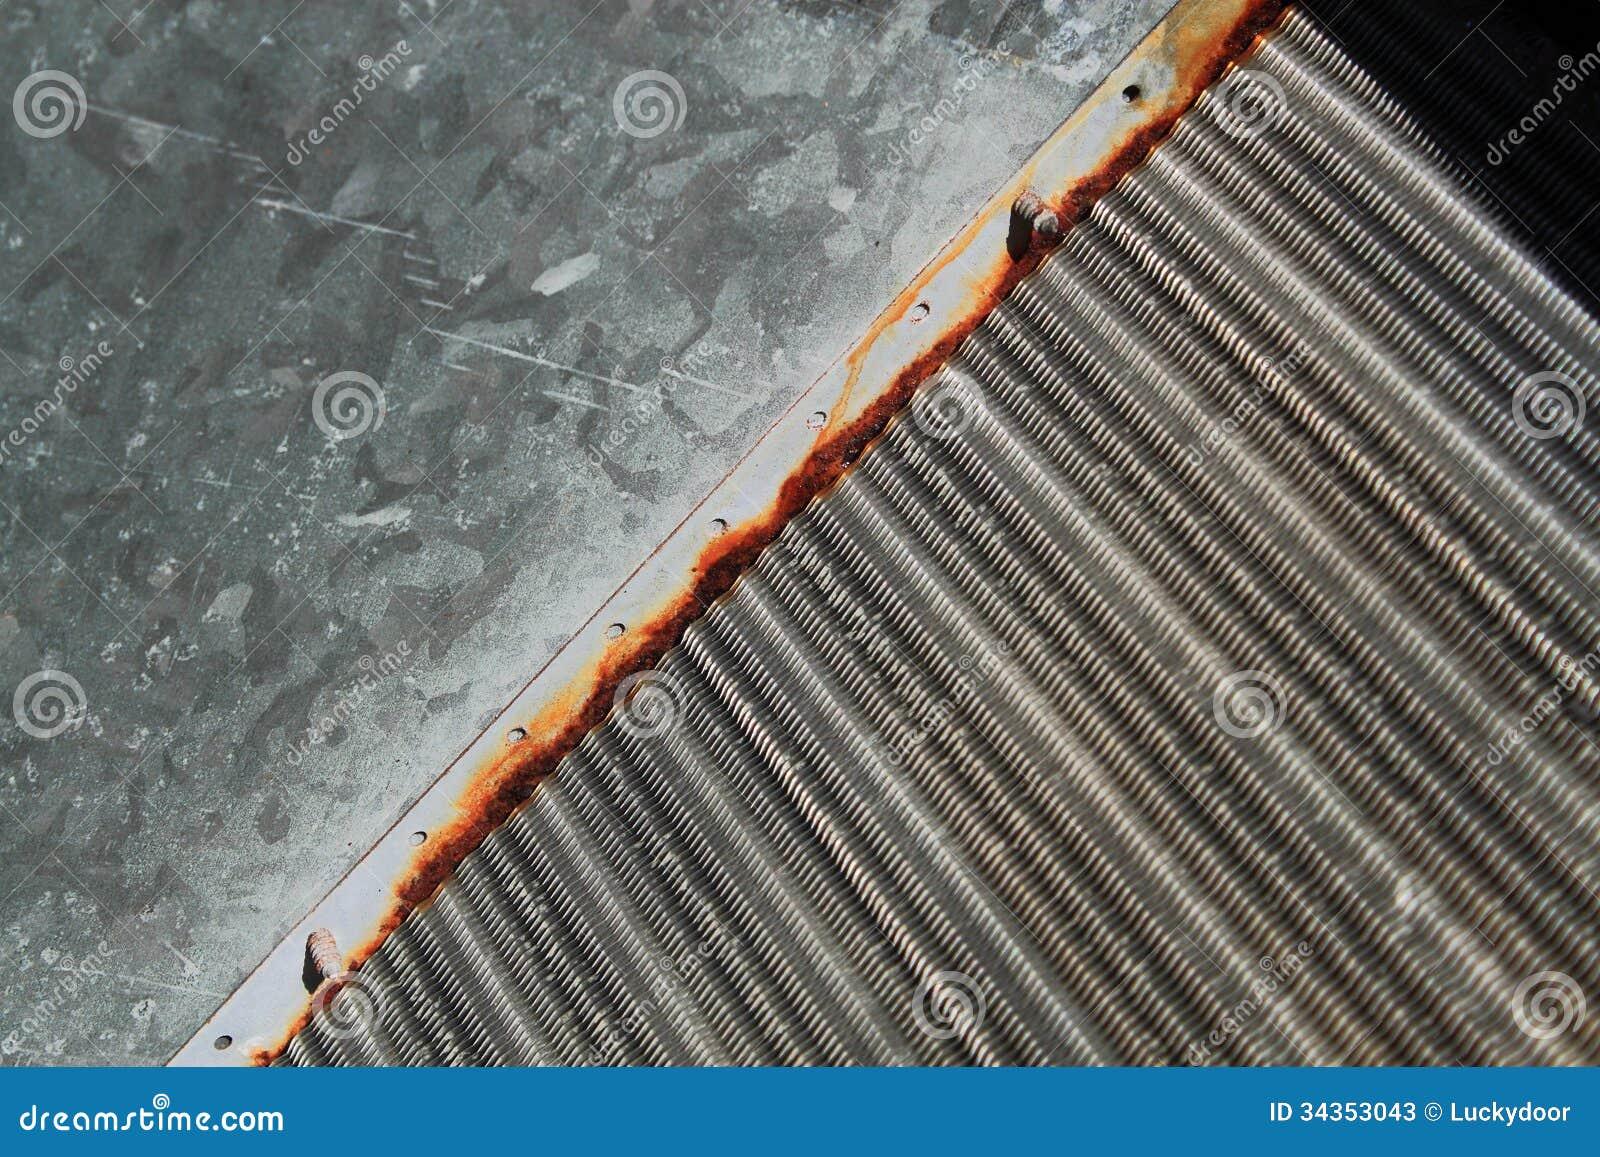 Rustic Condenser Coil